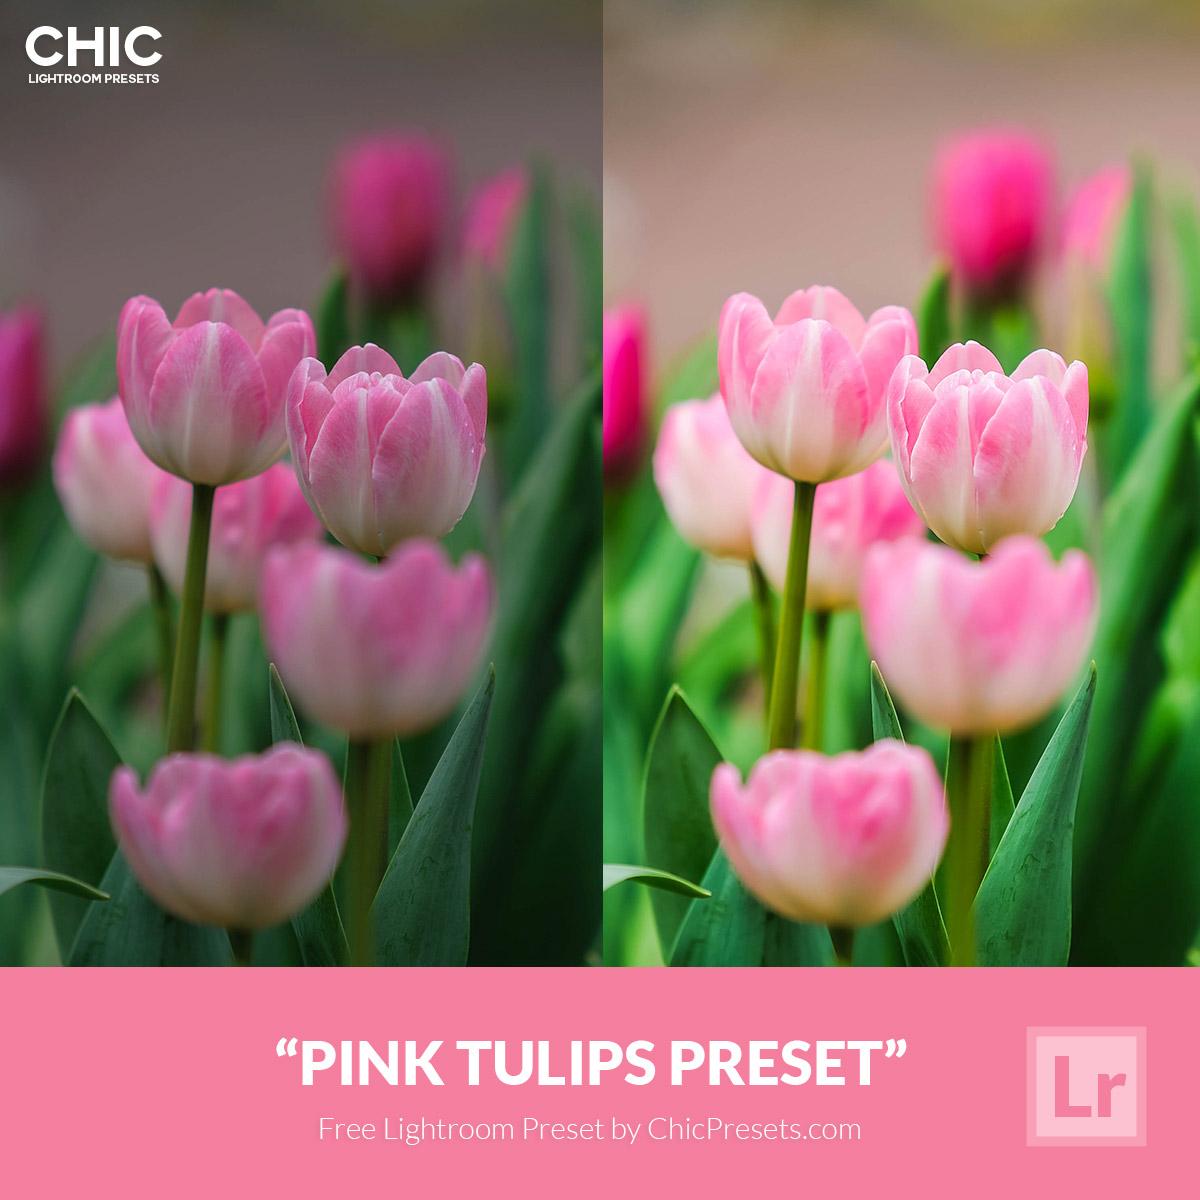 Free-Lightroom-Preset-Pink-Tulips-Chic